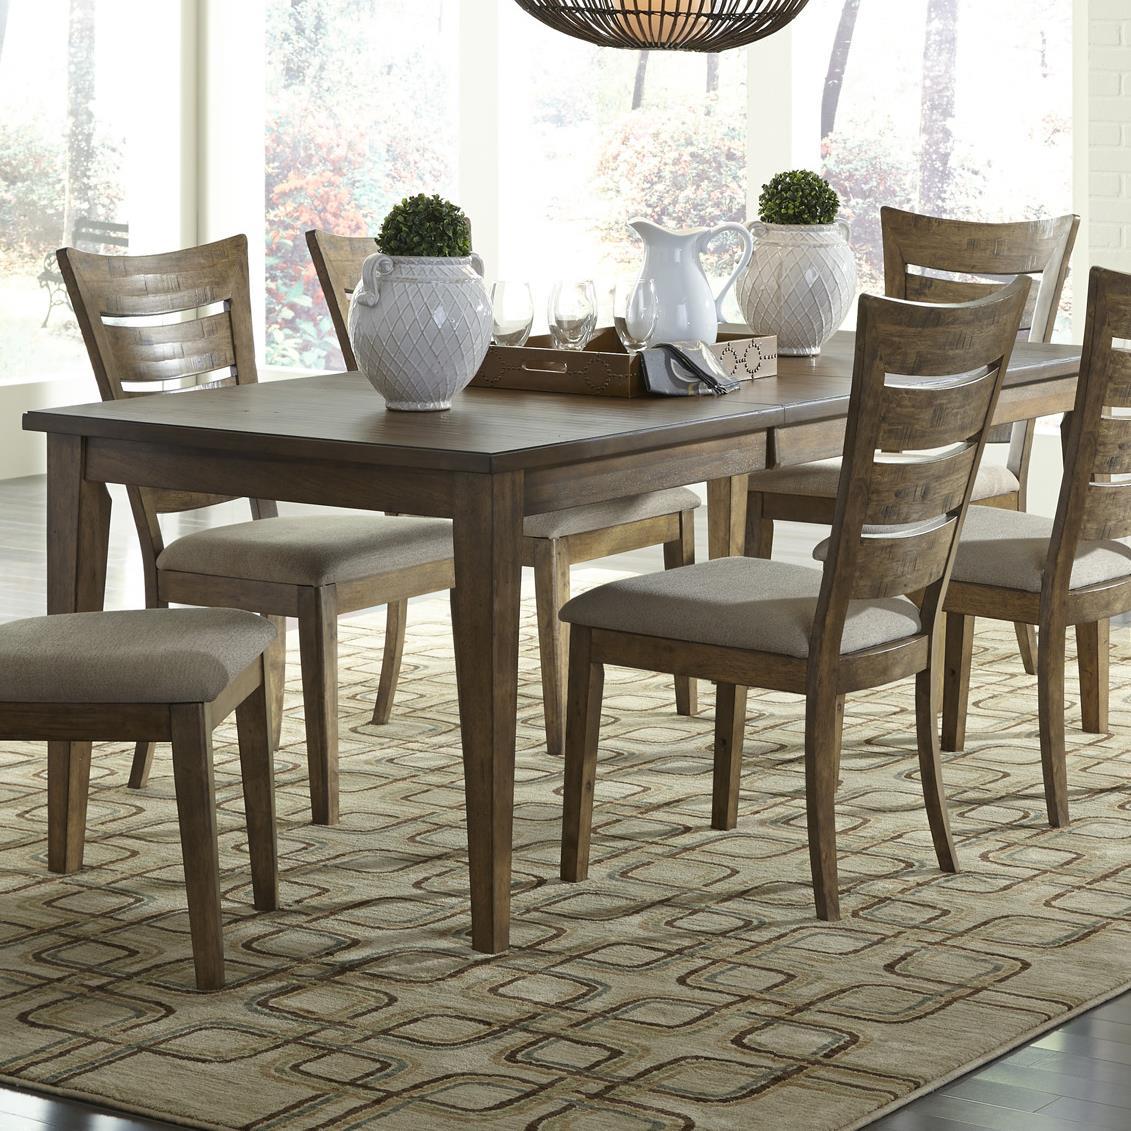 Liberty Furniture Pebble Creek Rectangular Leg Table - Item Number: 376-T3681